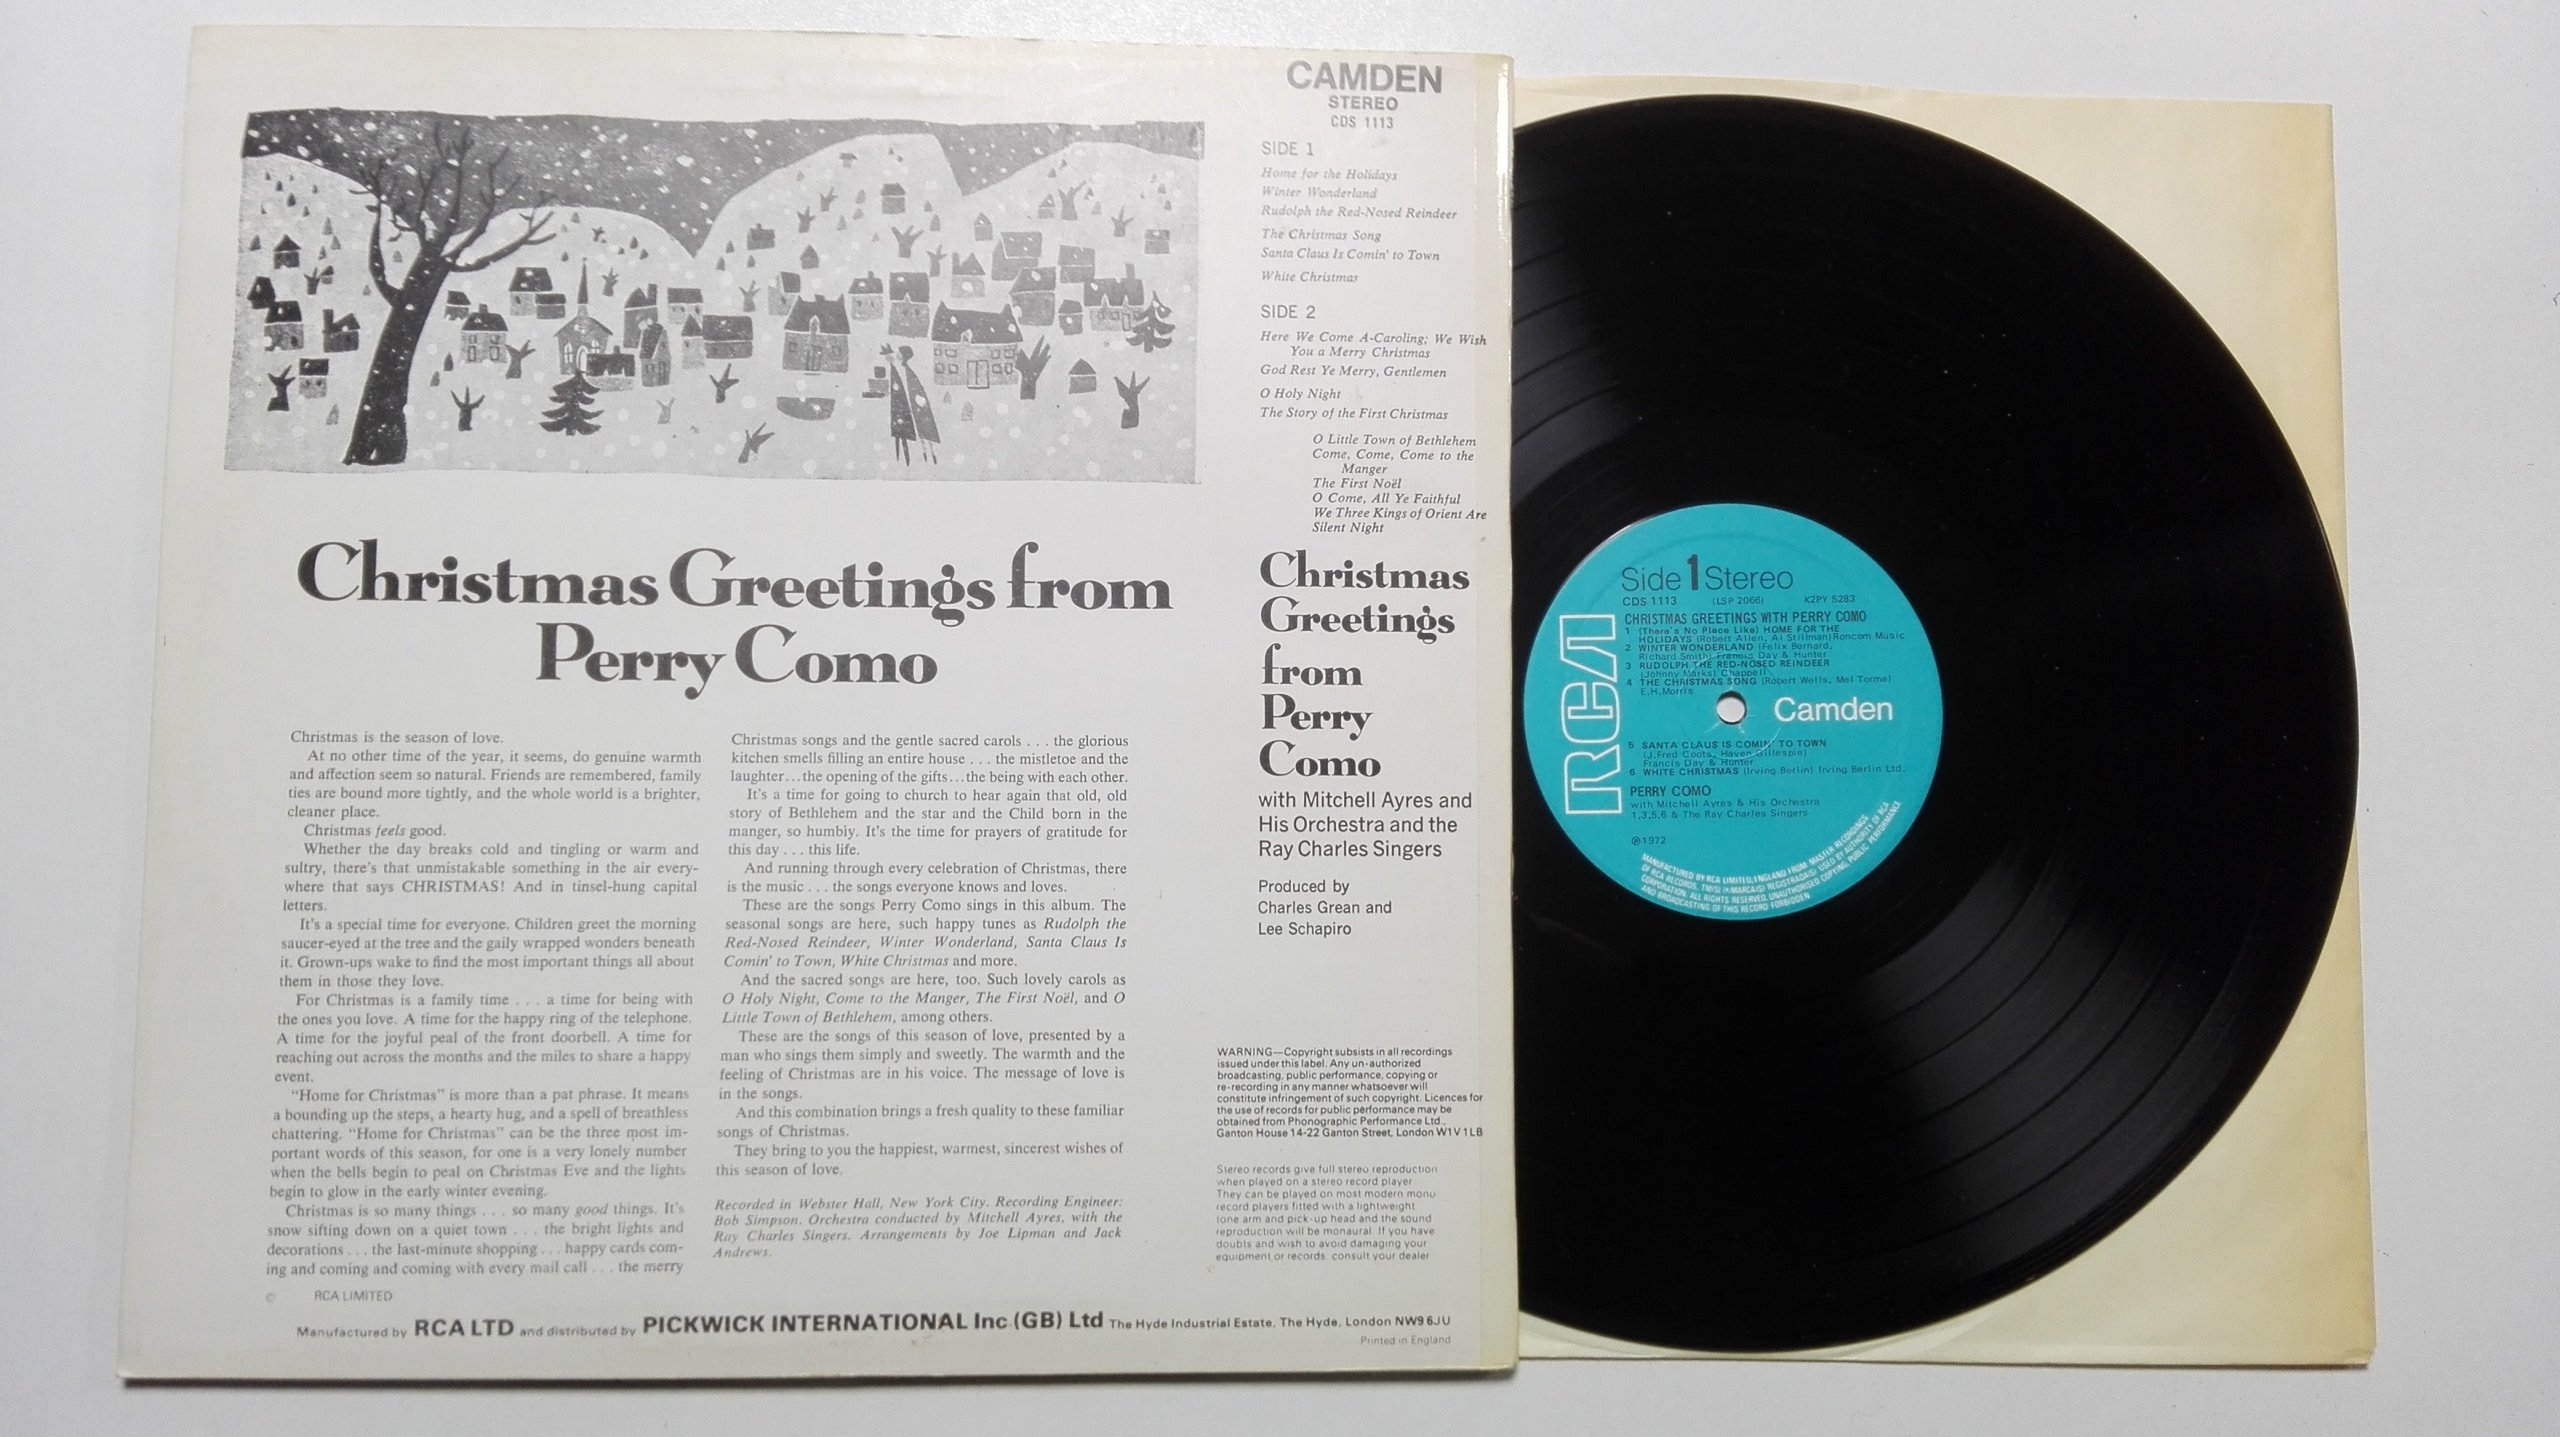 Perry como christmas greetings from perry como 7081465999 perry como christmas greetings from perry como 7081465999 m4hsunfo